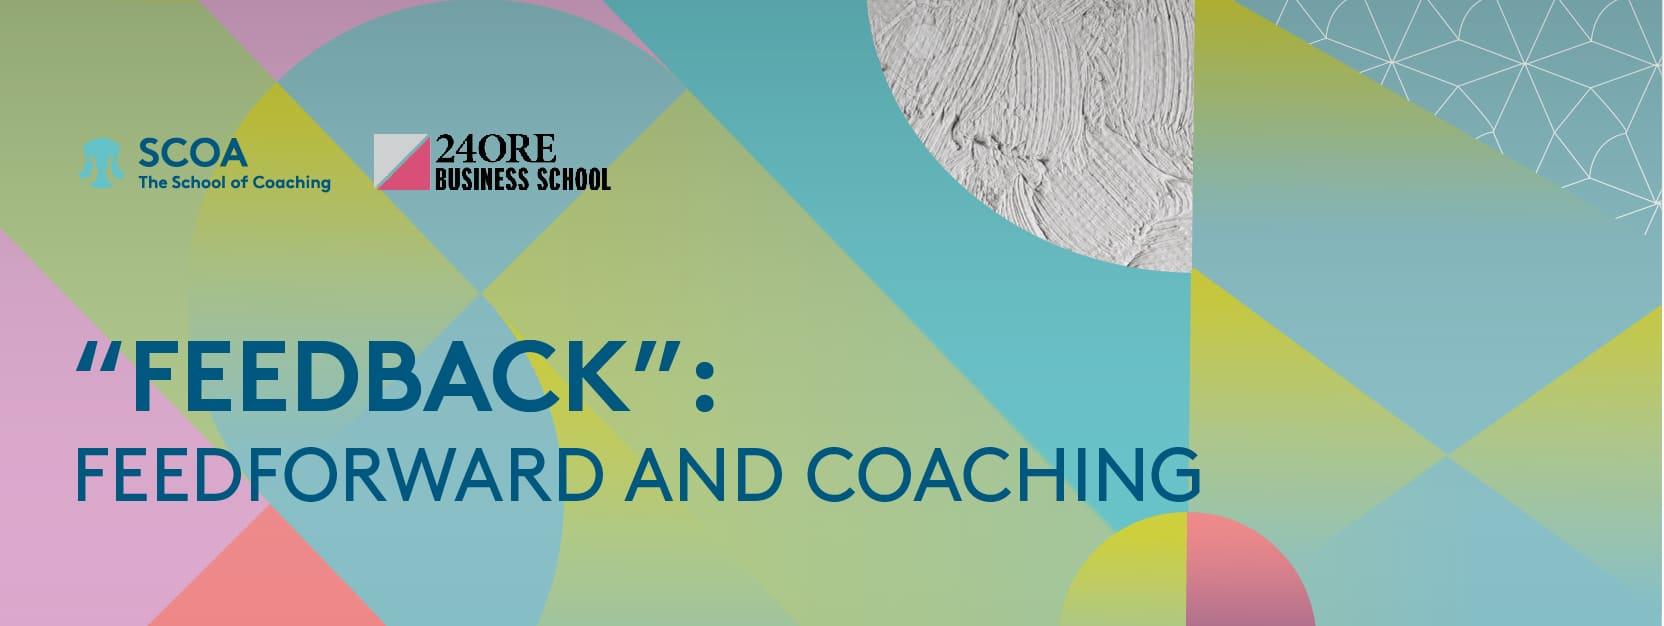 Feedback, Feedforward e Coaching Conversation